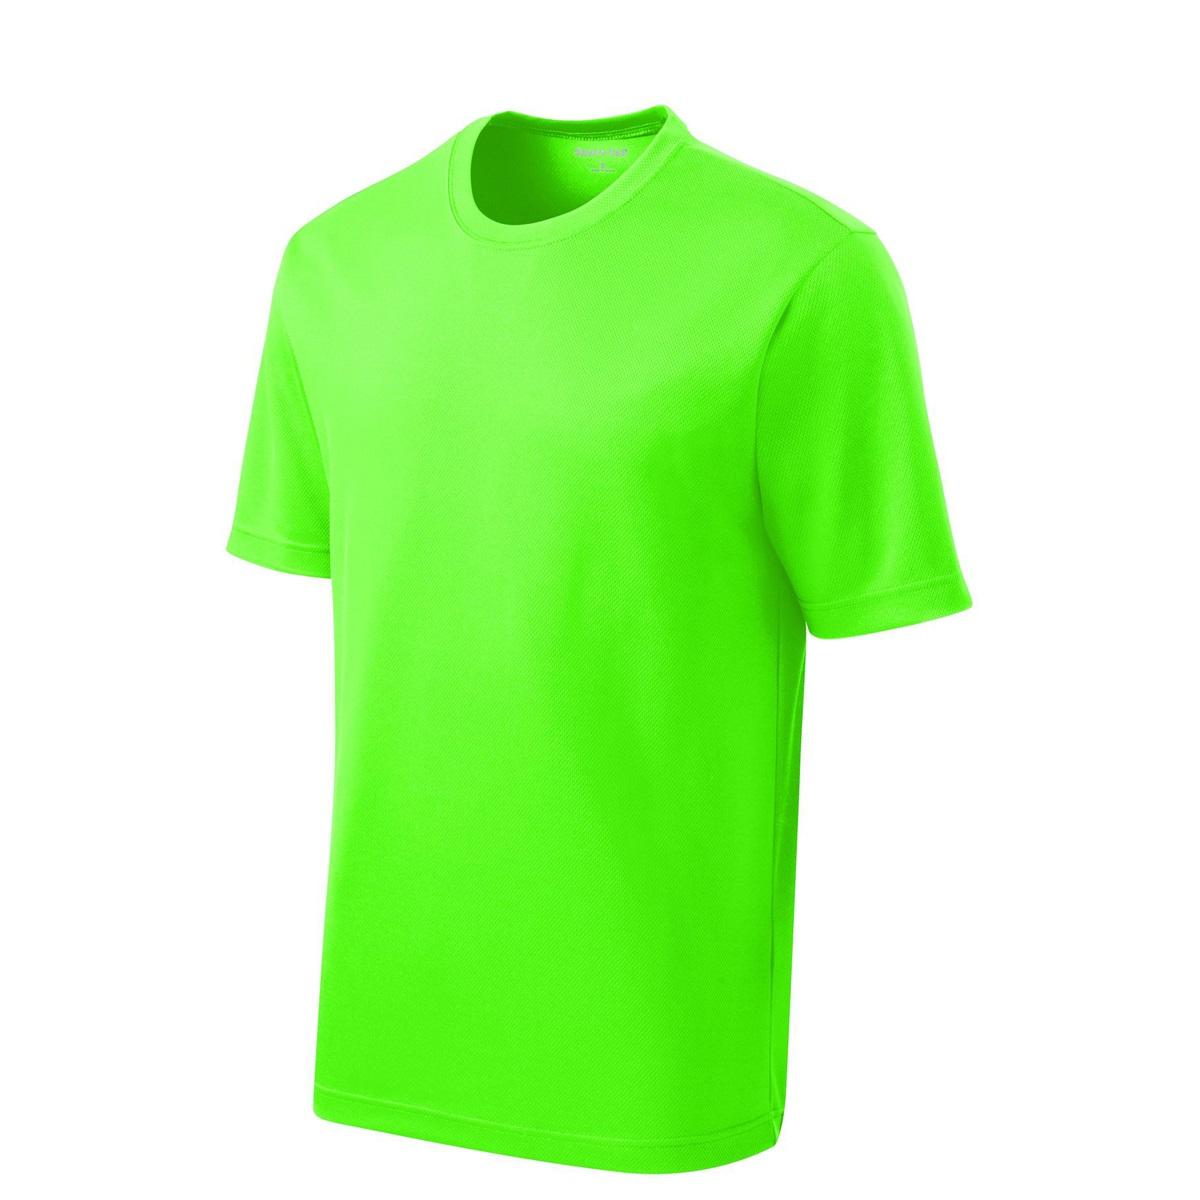 Neon Color Shirts 28 Images Neon Pot Leaf Asst Colors T Shirt Ebay 2014 New Popular Usa